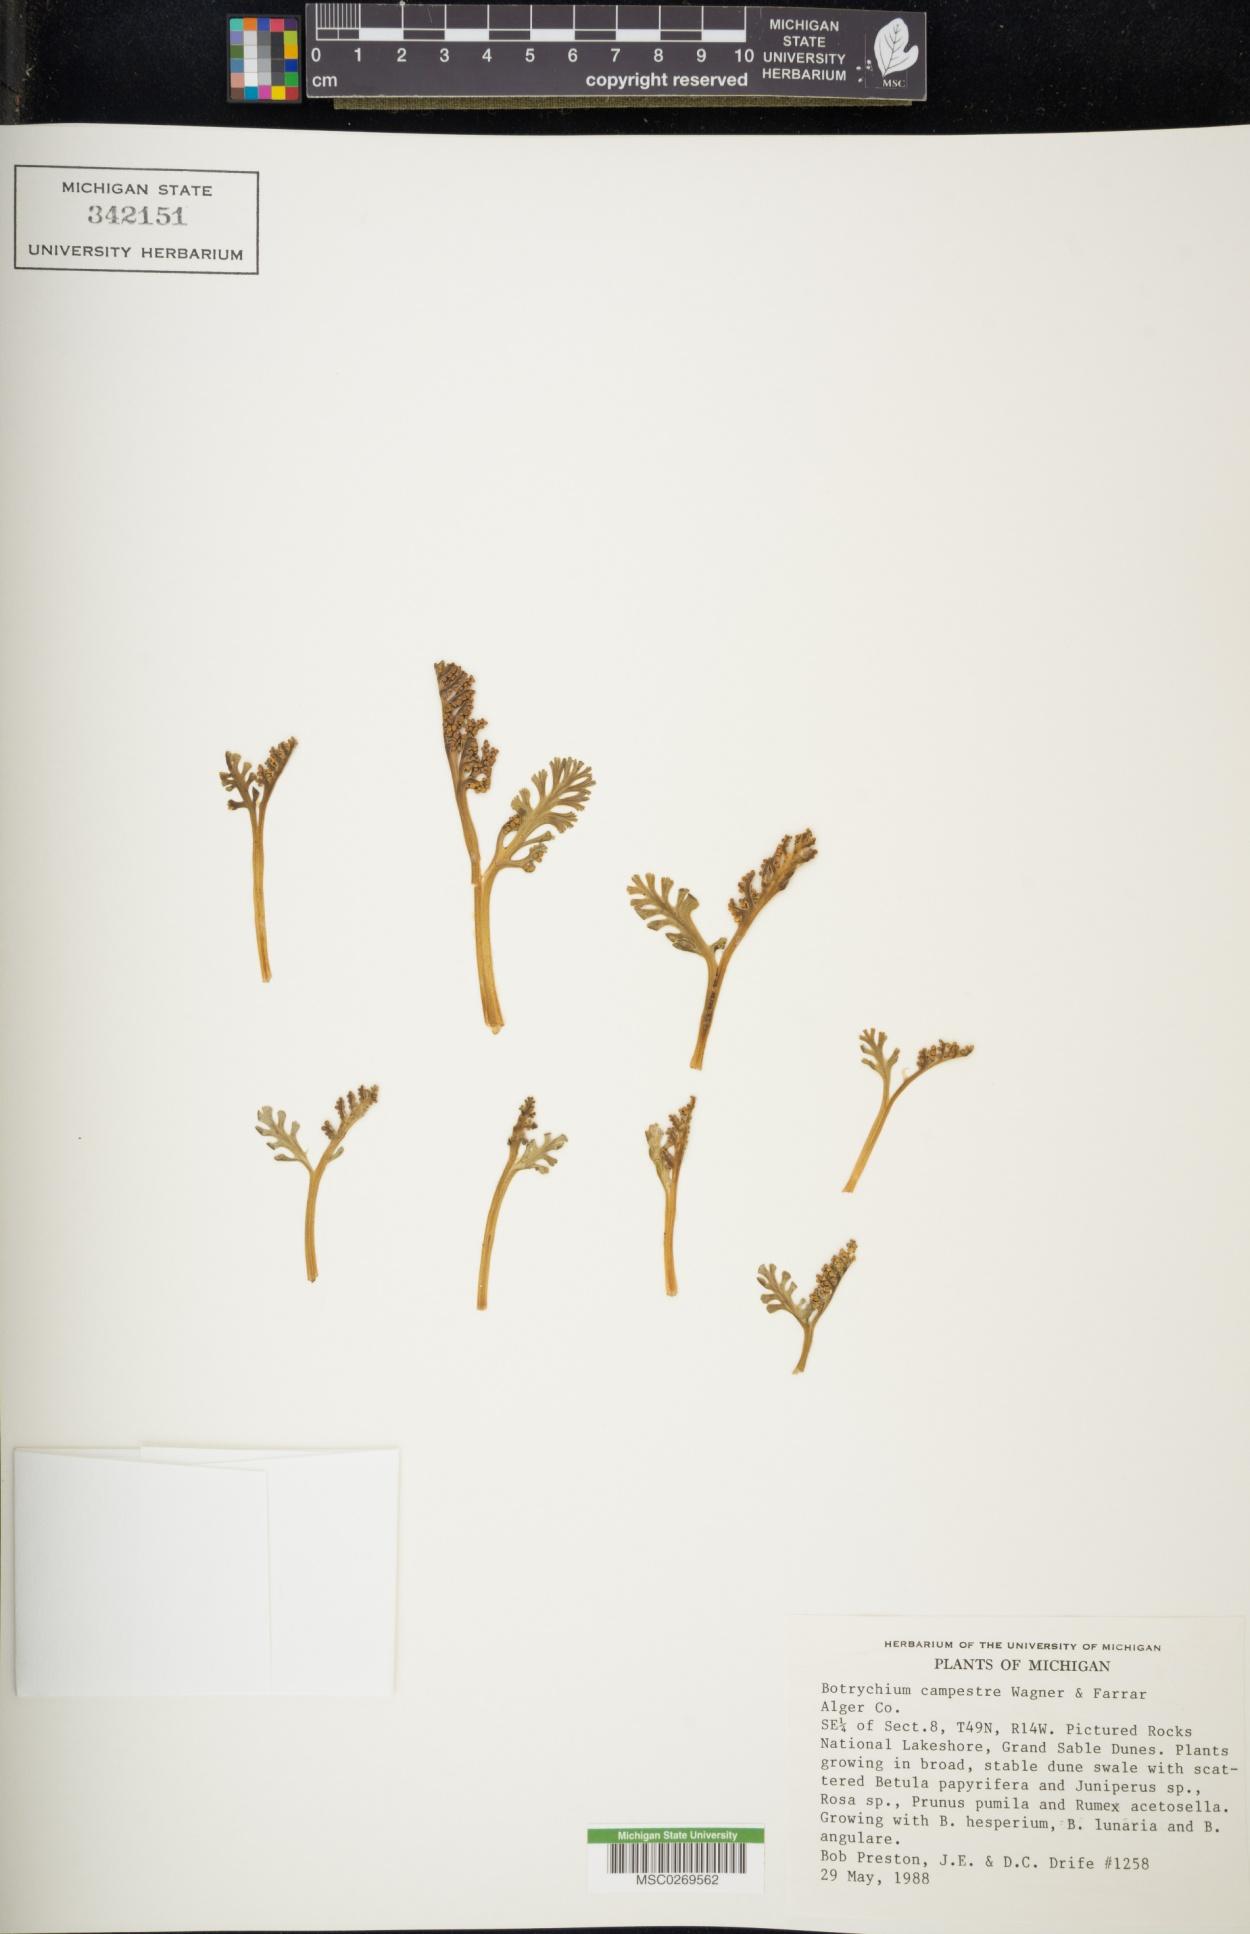 Botrychium campestre image